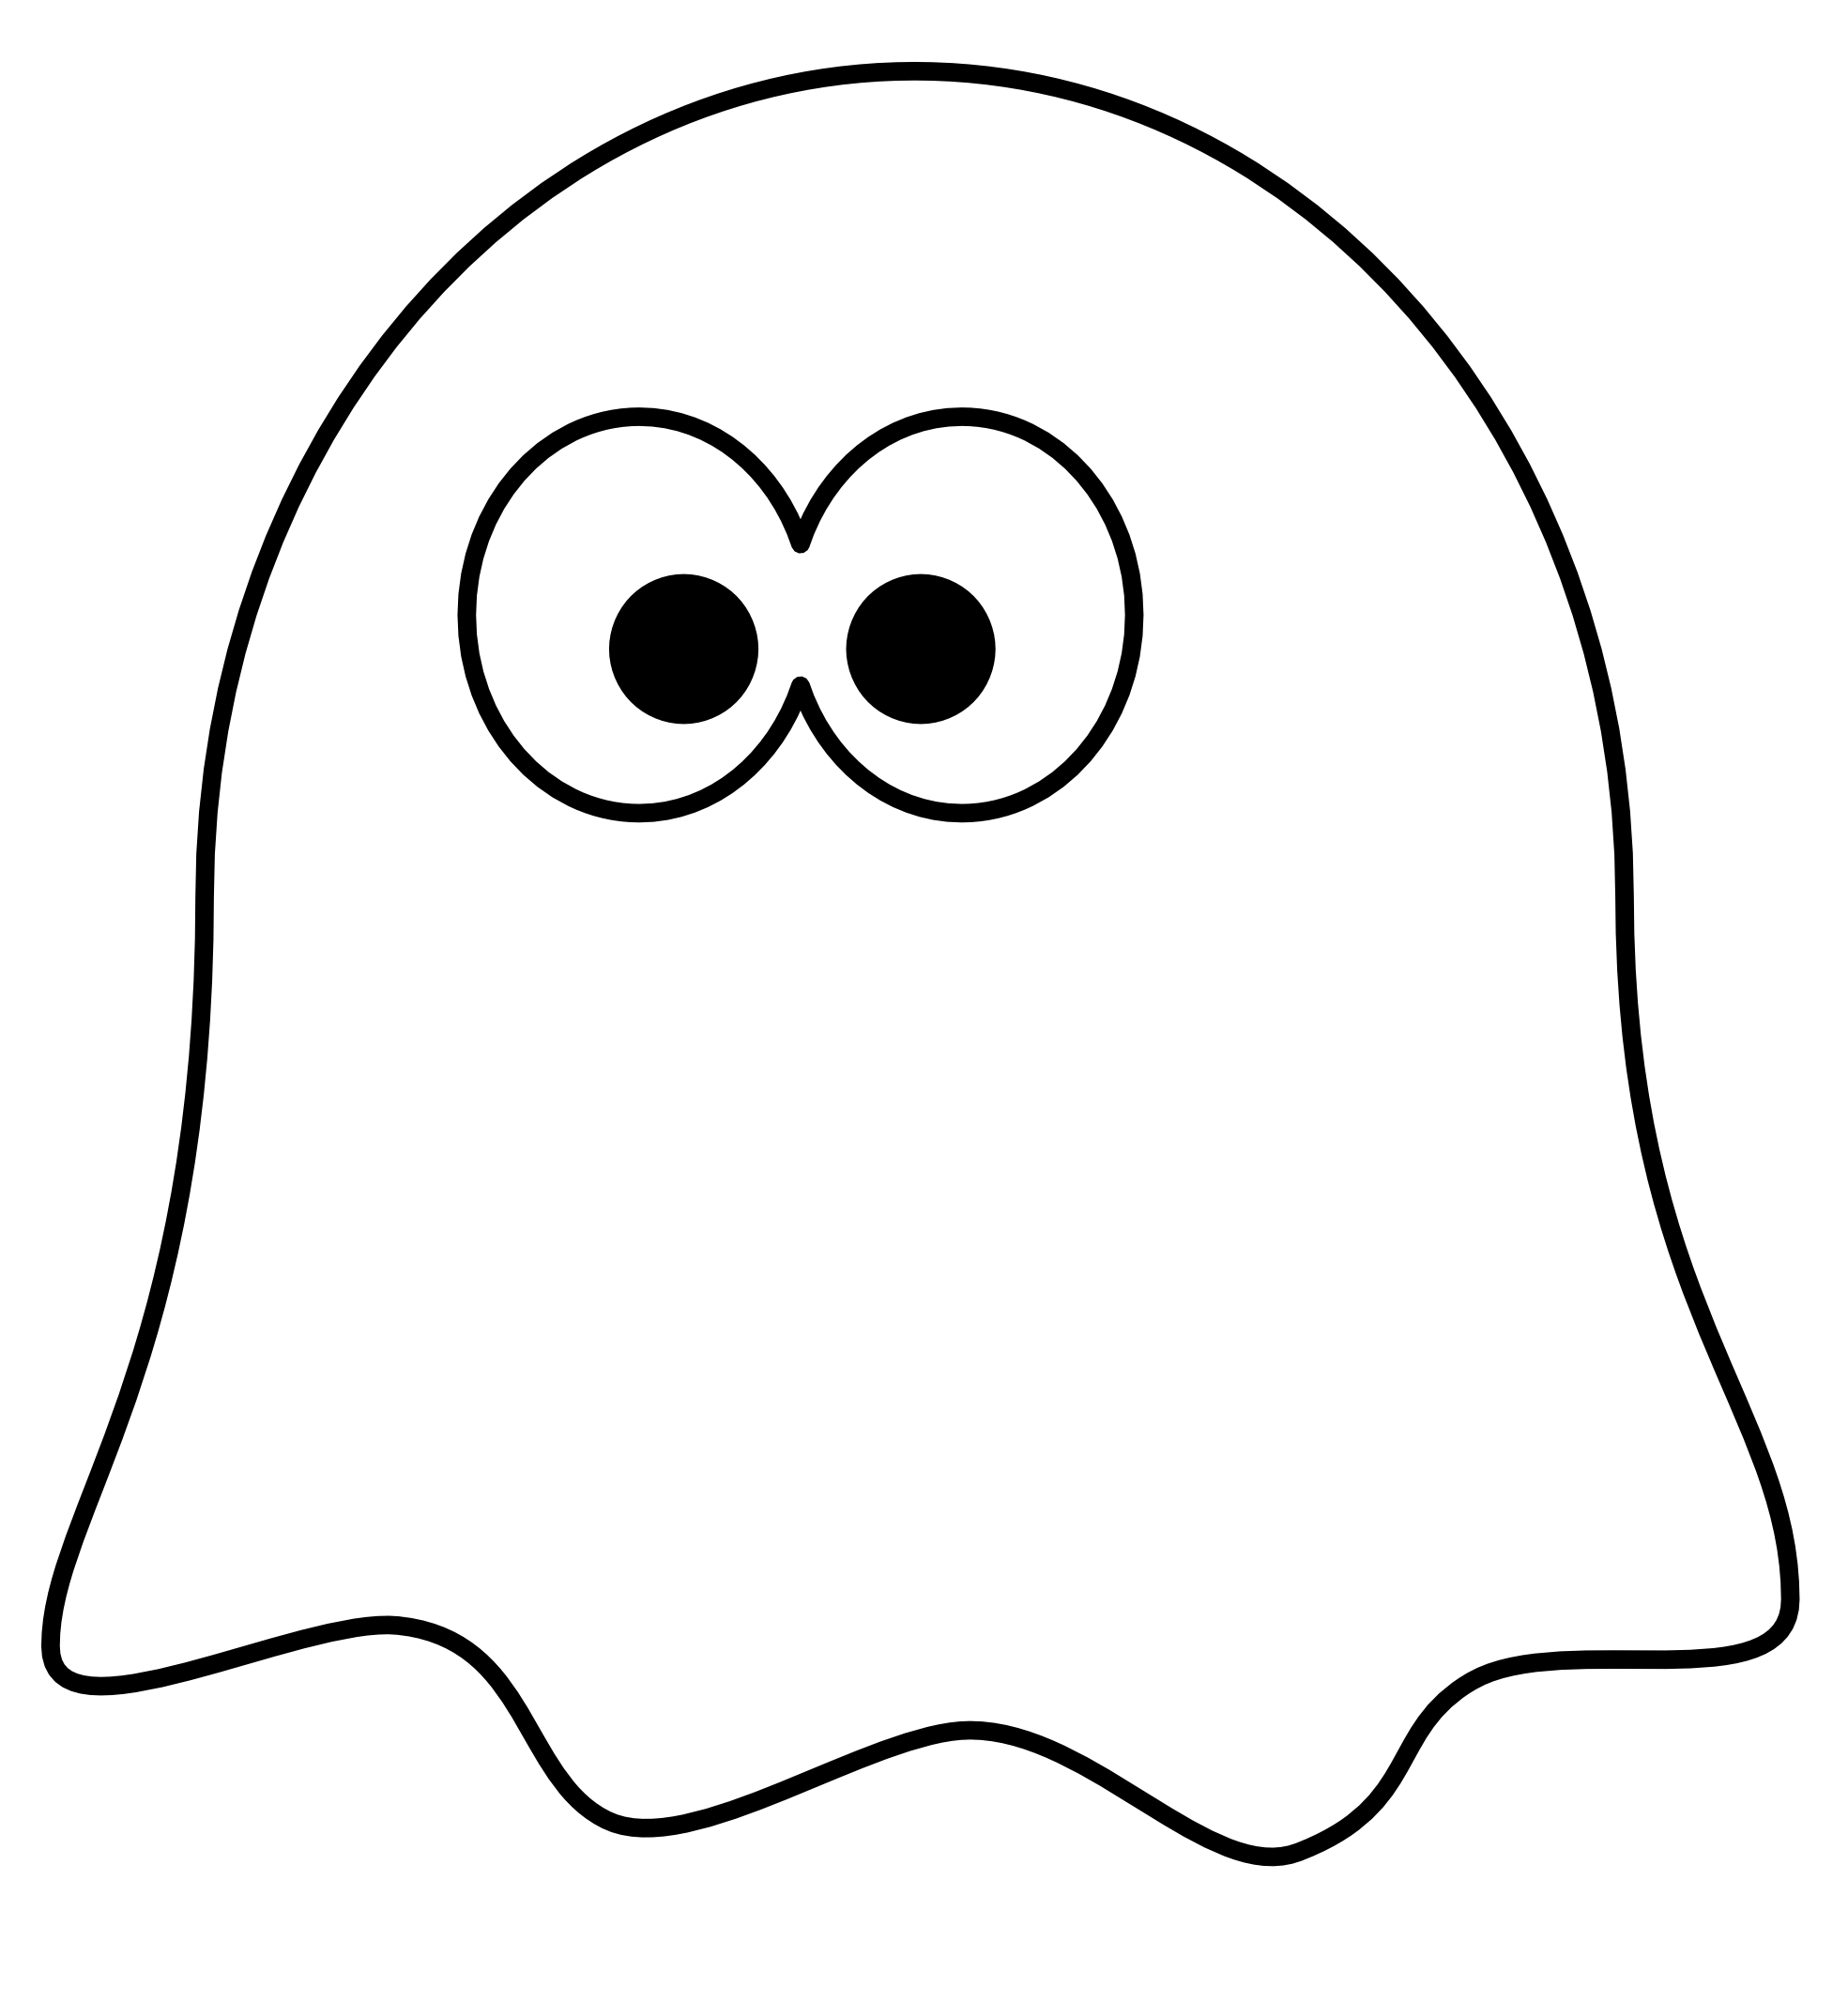 Ghost Outline Clip Art